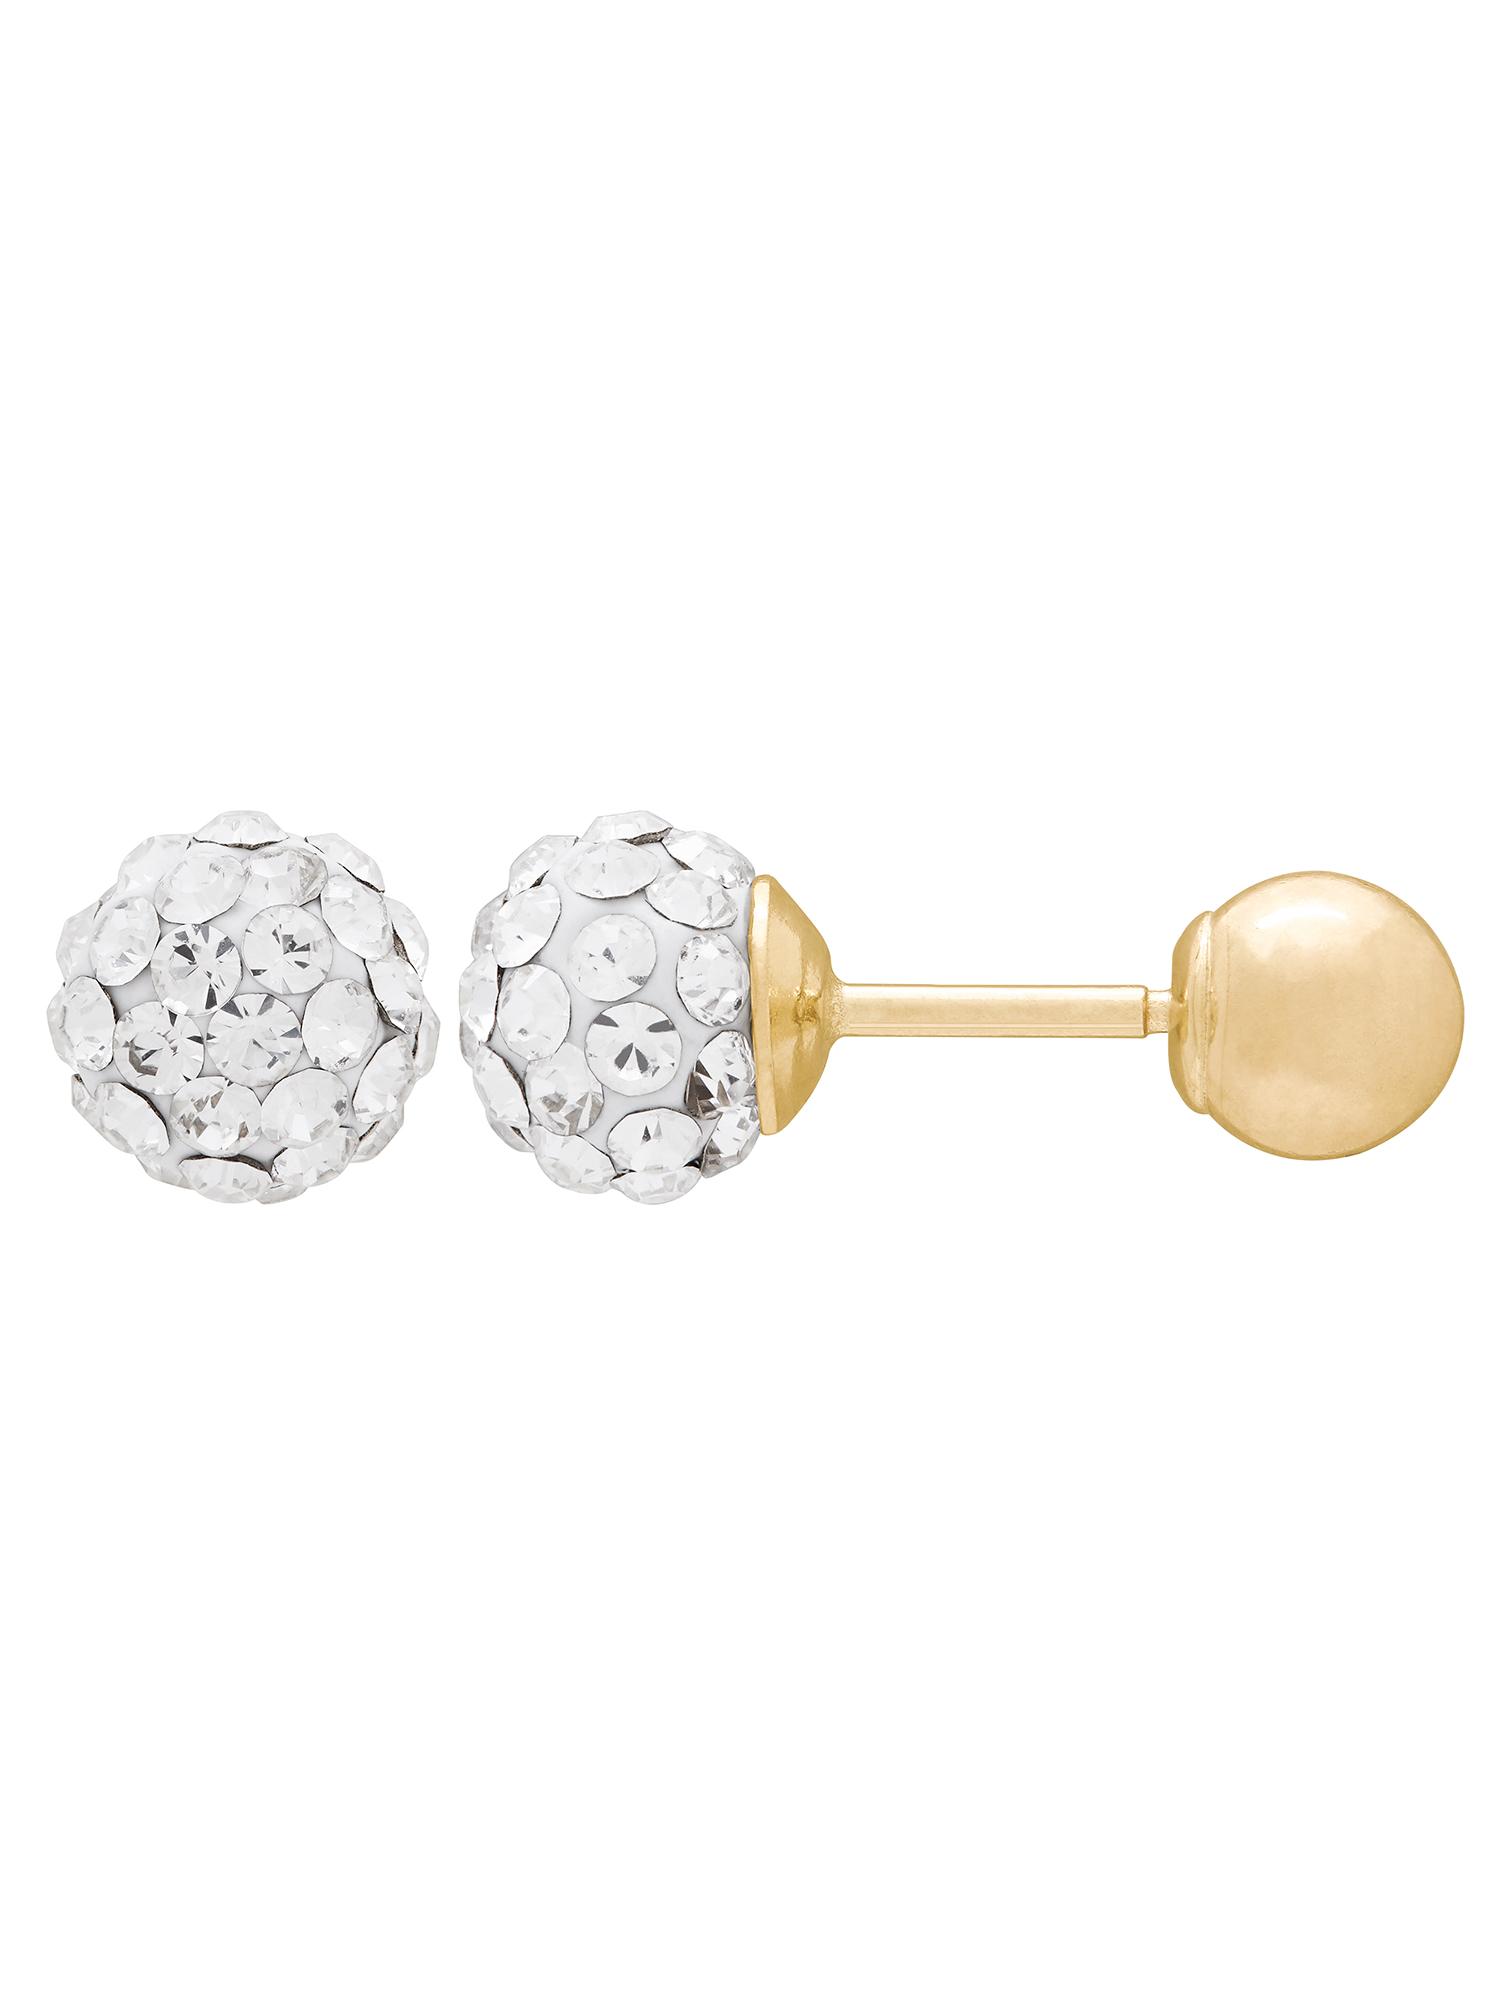 Kids' 10K Yellow Gold 4.8mm White Crystal Ball/4mm Ball Stud Earrings